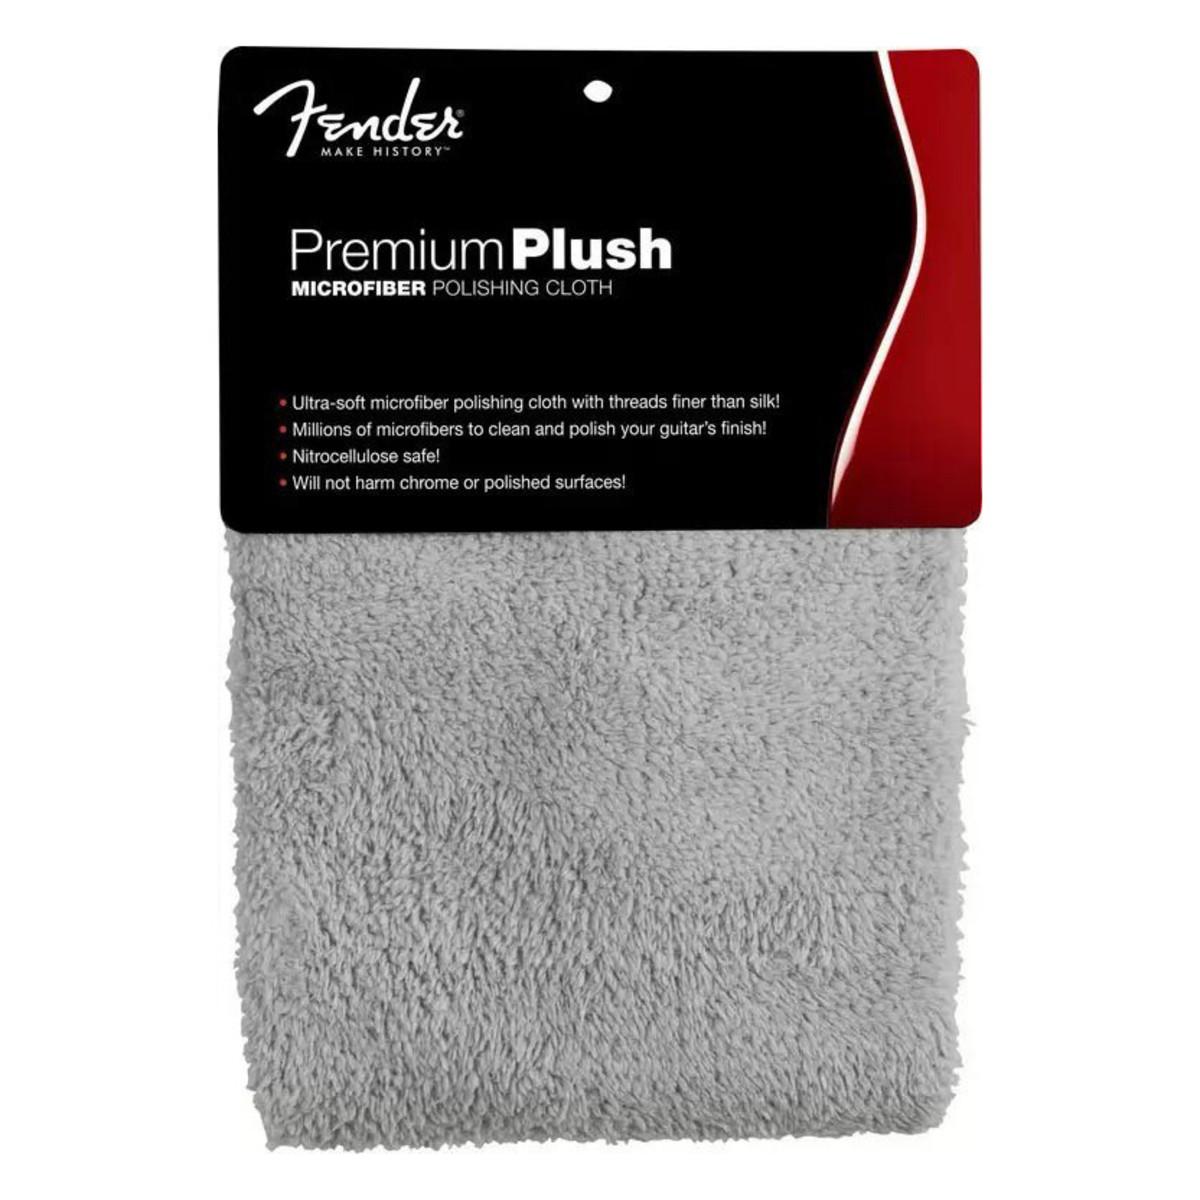 Microfiber Cloth Jb Hi Fi: Fender Premium Plush Microfiber Polishing Cloth At Gear4music